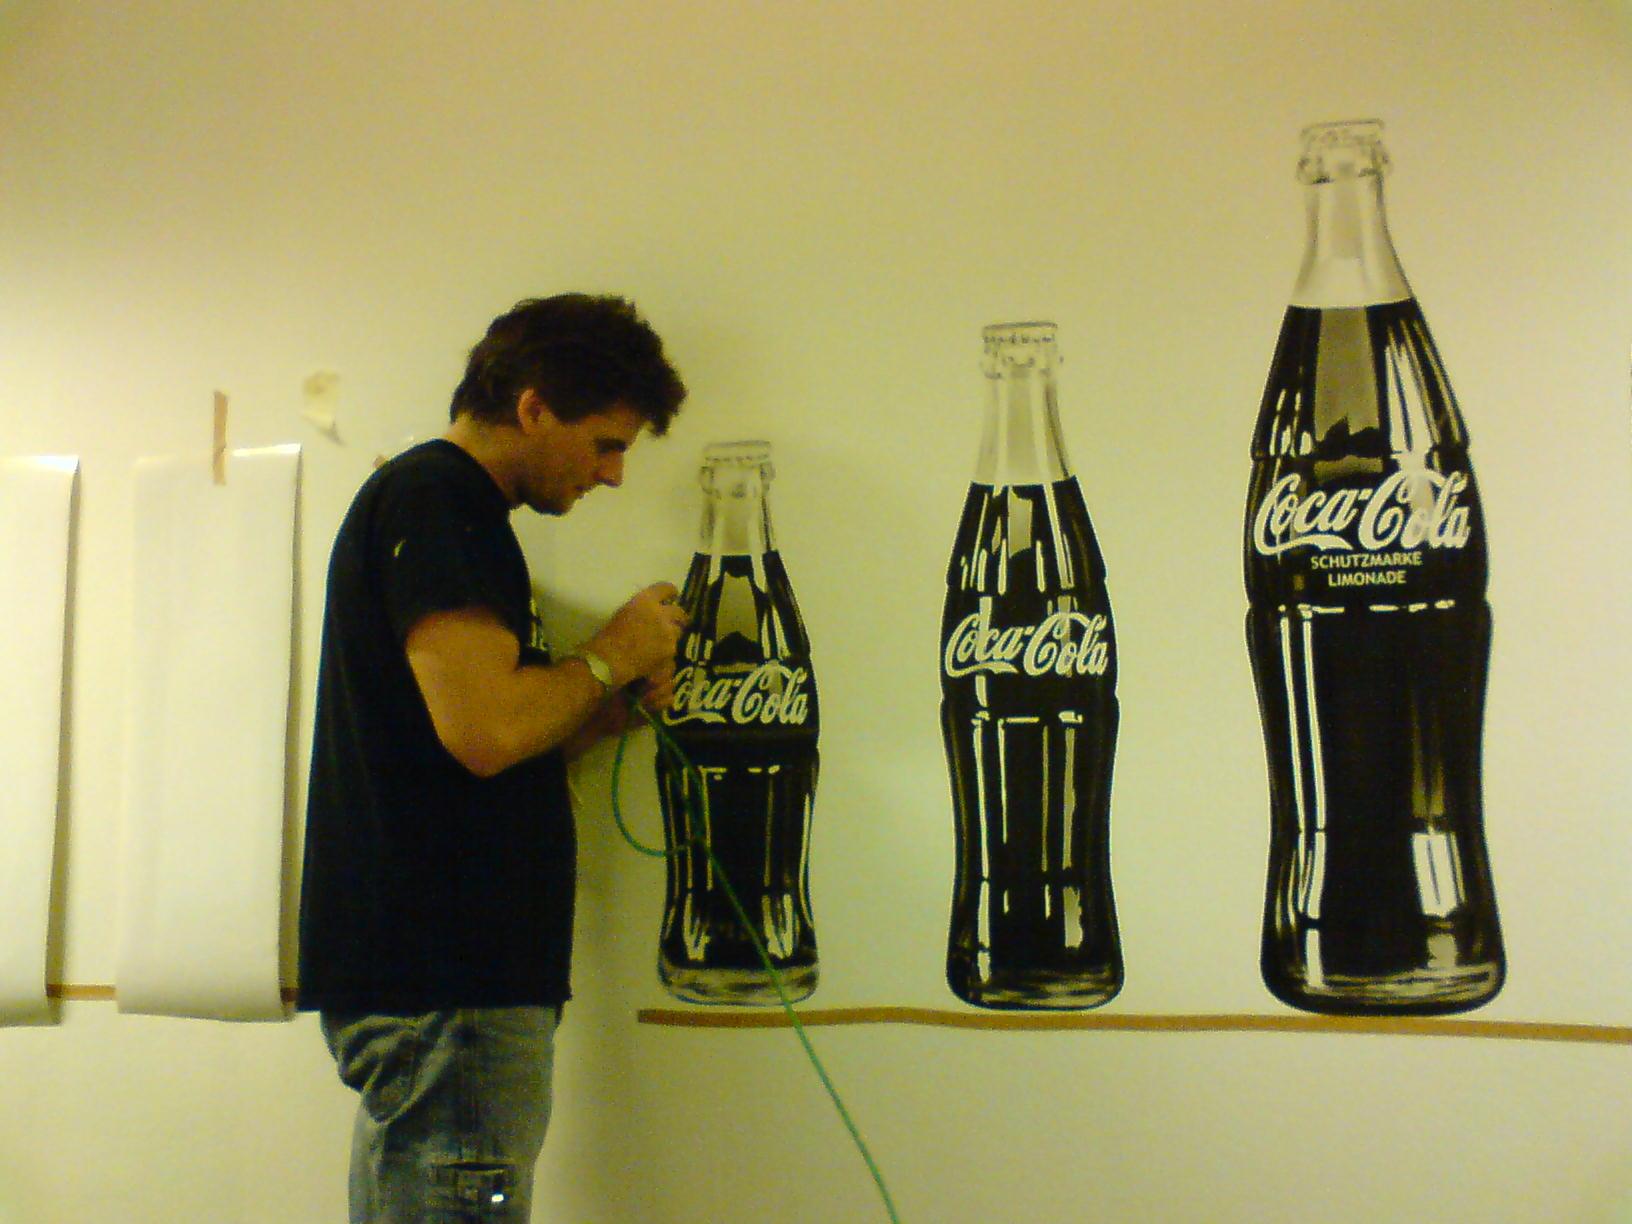 Airbrush Wandbemalung Meetingraum Coca Cola Flaschen Making of - Arbeiten mit Torsten Rachu - Top-Airbrush